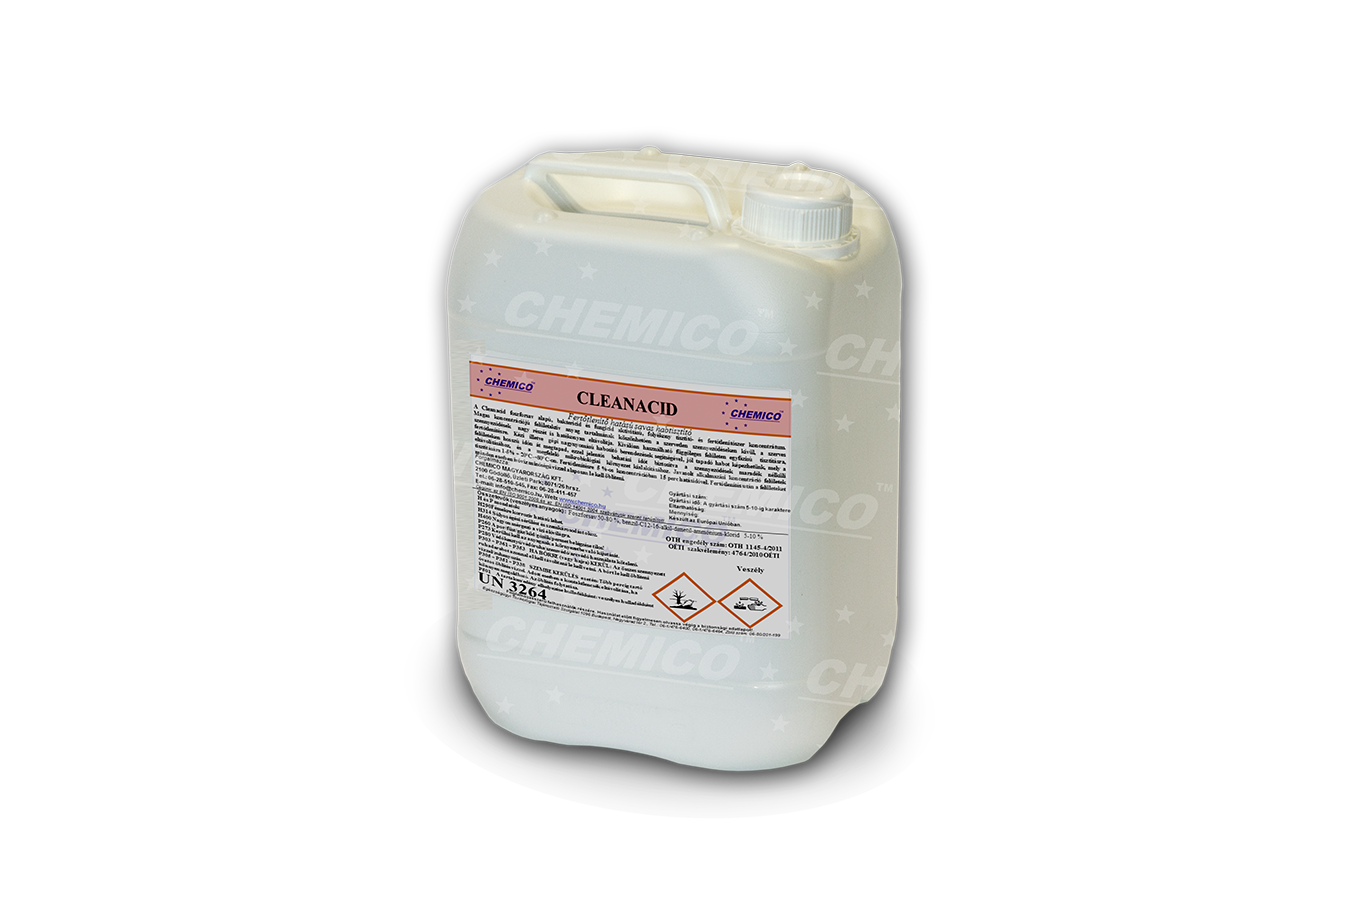 cleanacid-vizkooldo-fertotlenito-savas-foszforsavas-rozsdamentes-ipari-chemico-5l